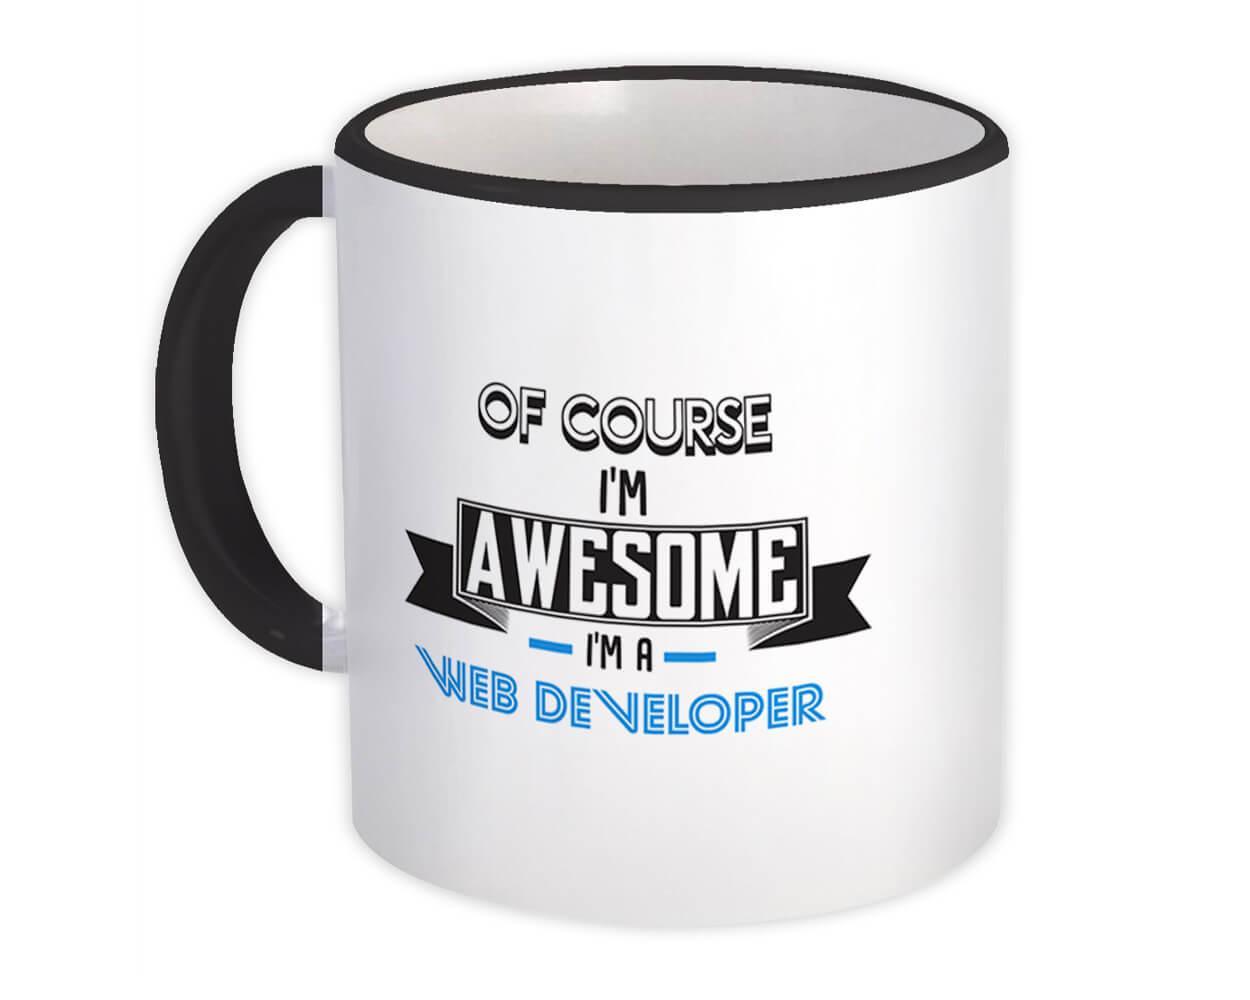 Awesome WEB DEVELOPER : Gift Mug Family Work Birthday Christmas